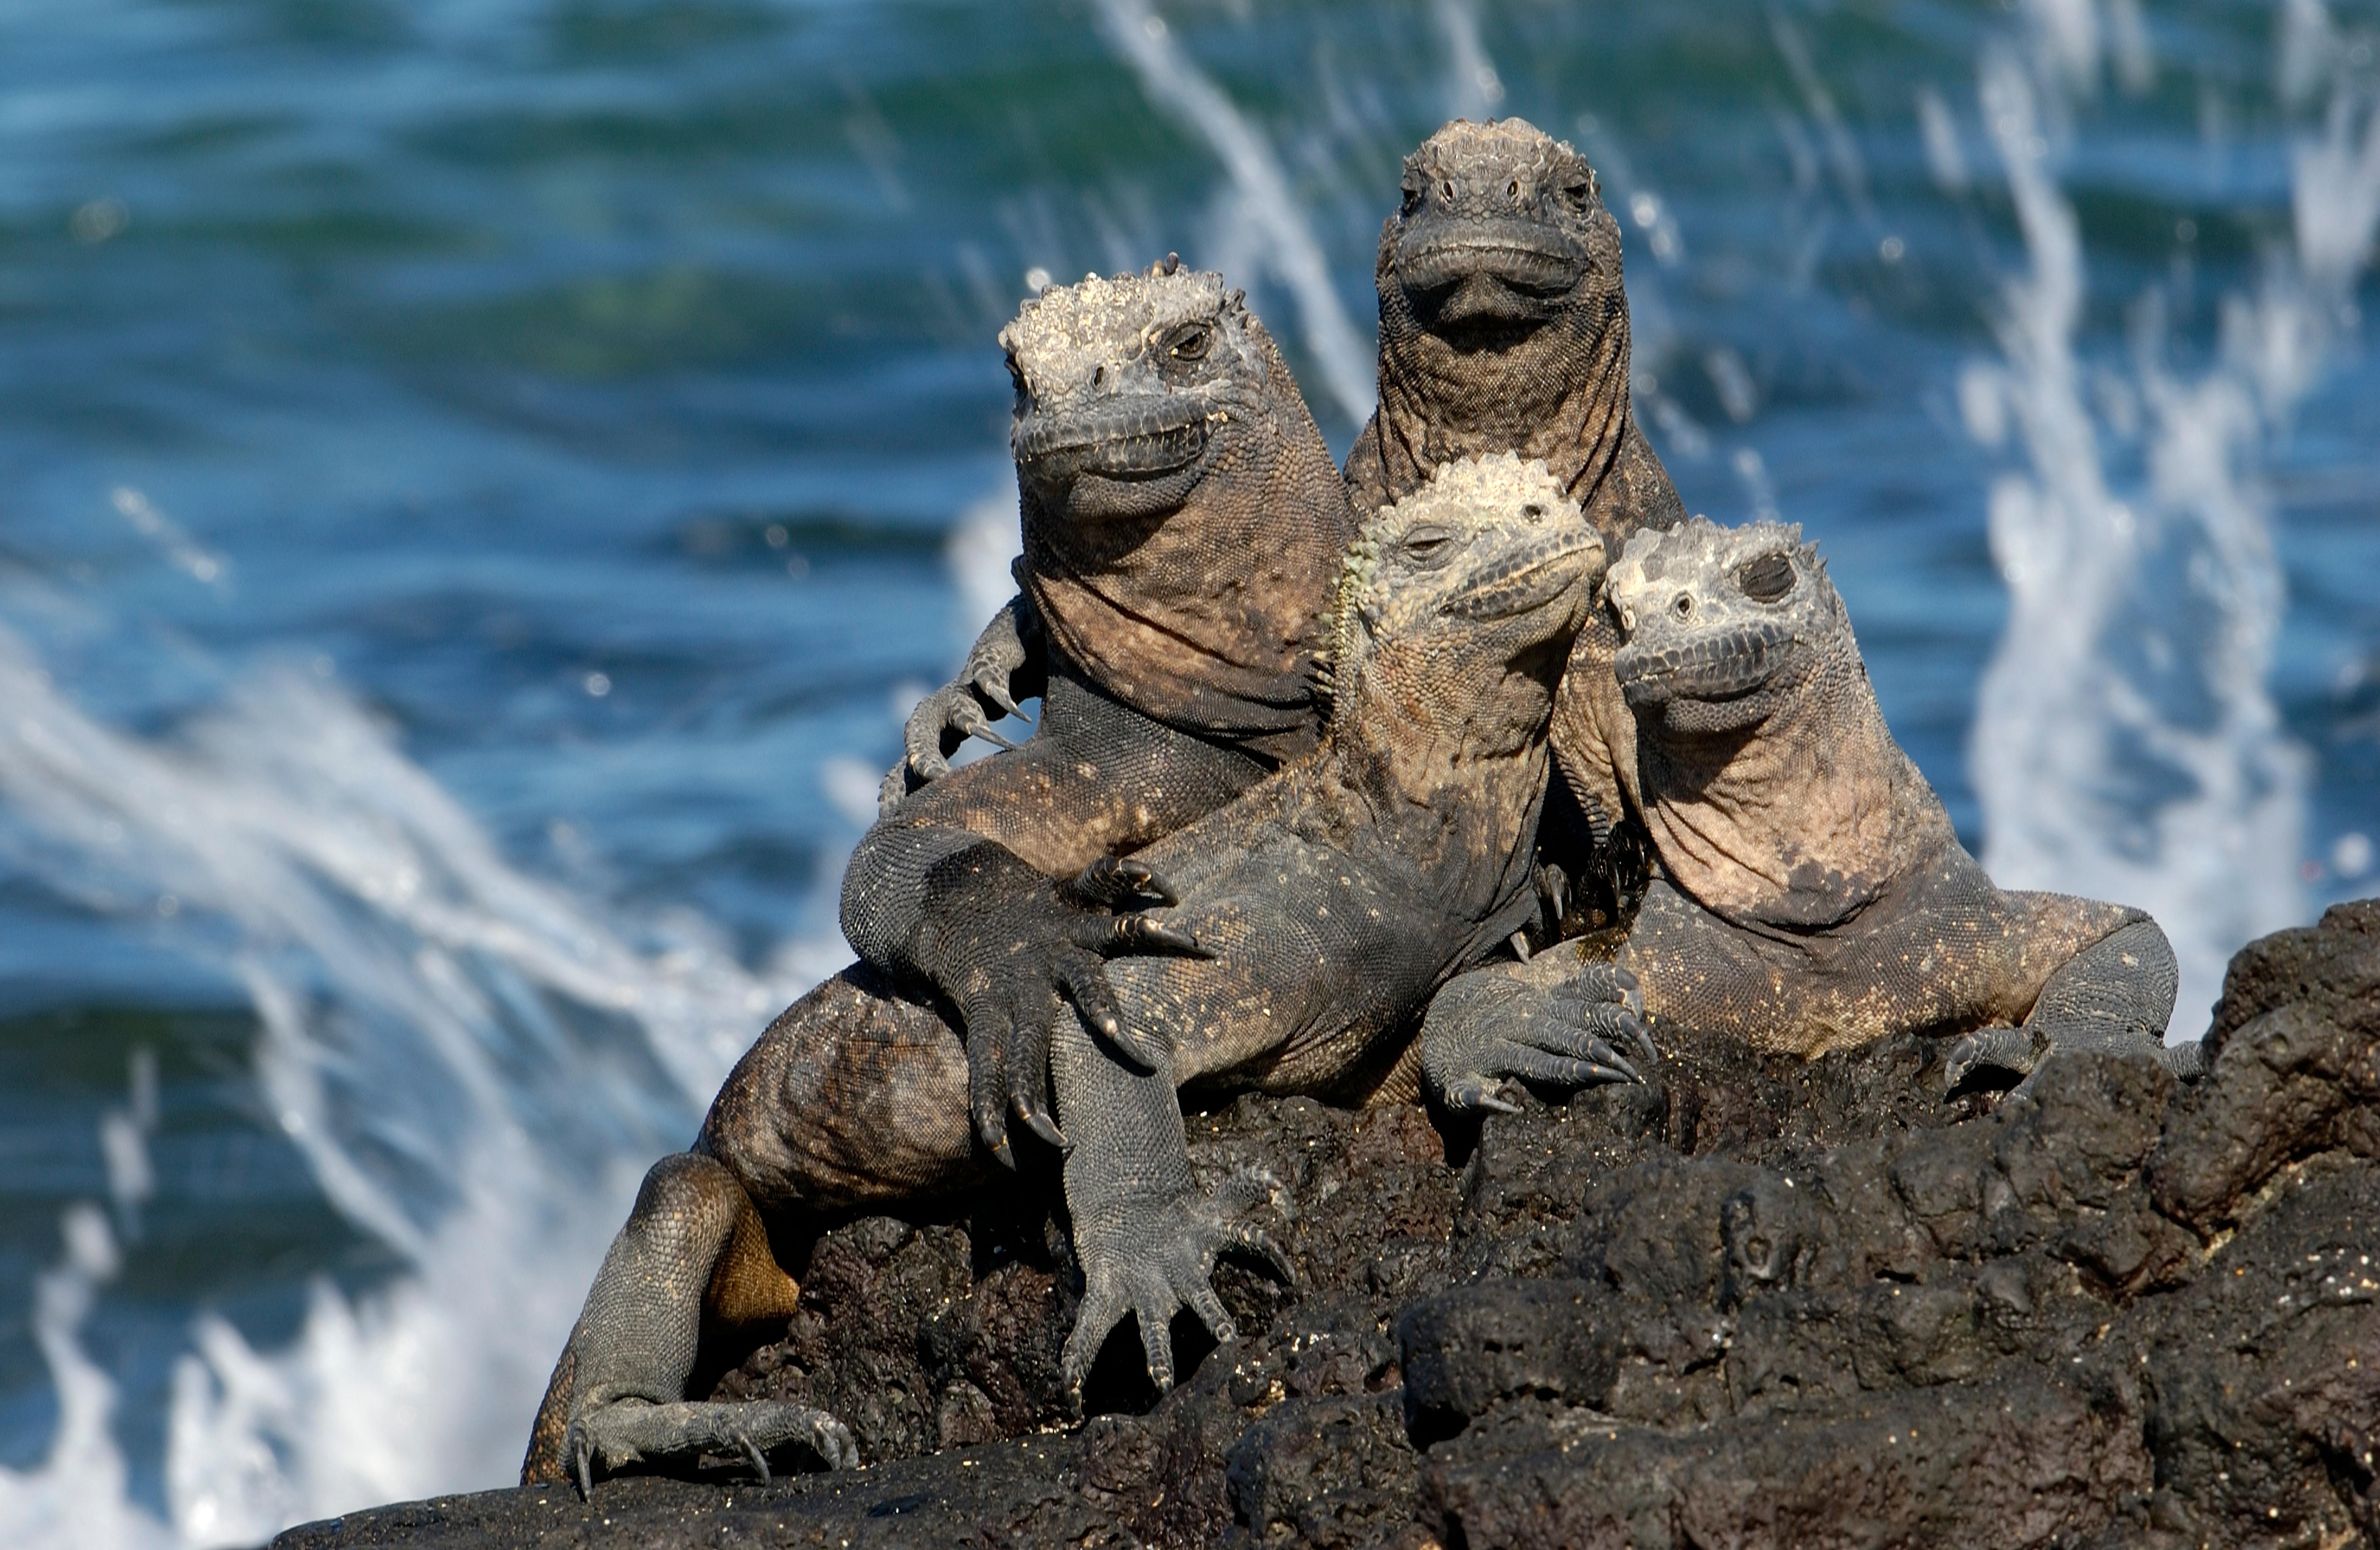 Galapagos_Animals_Marine_Iguana.jpg